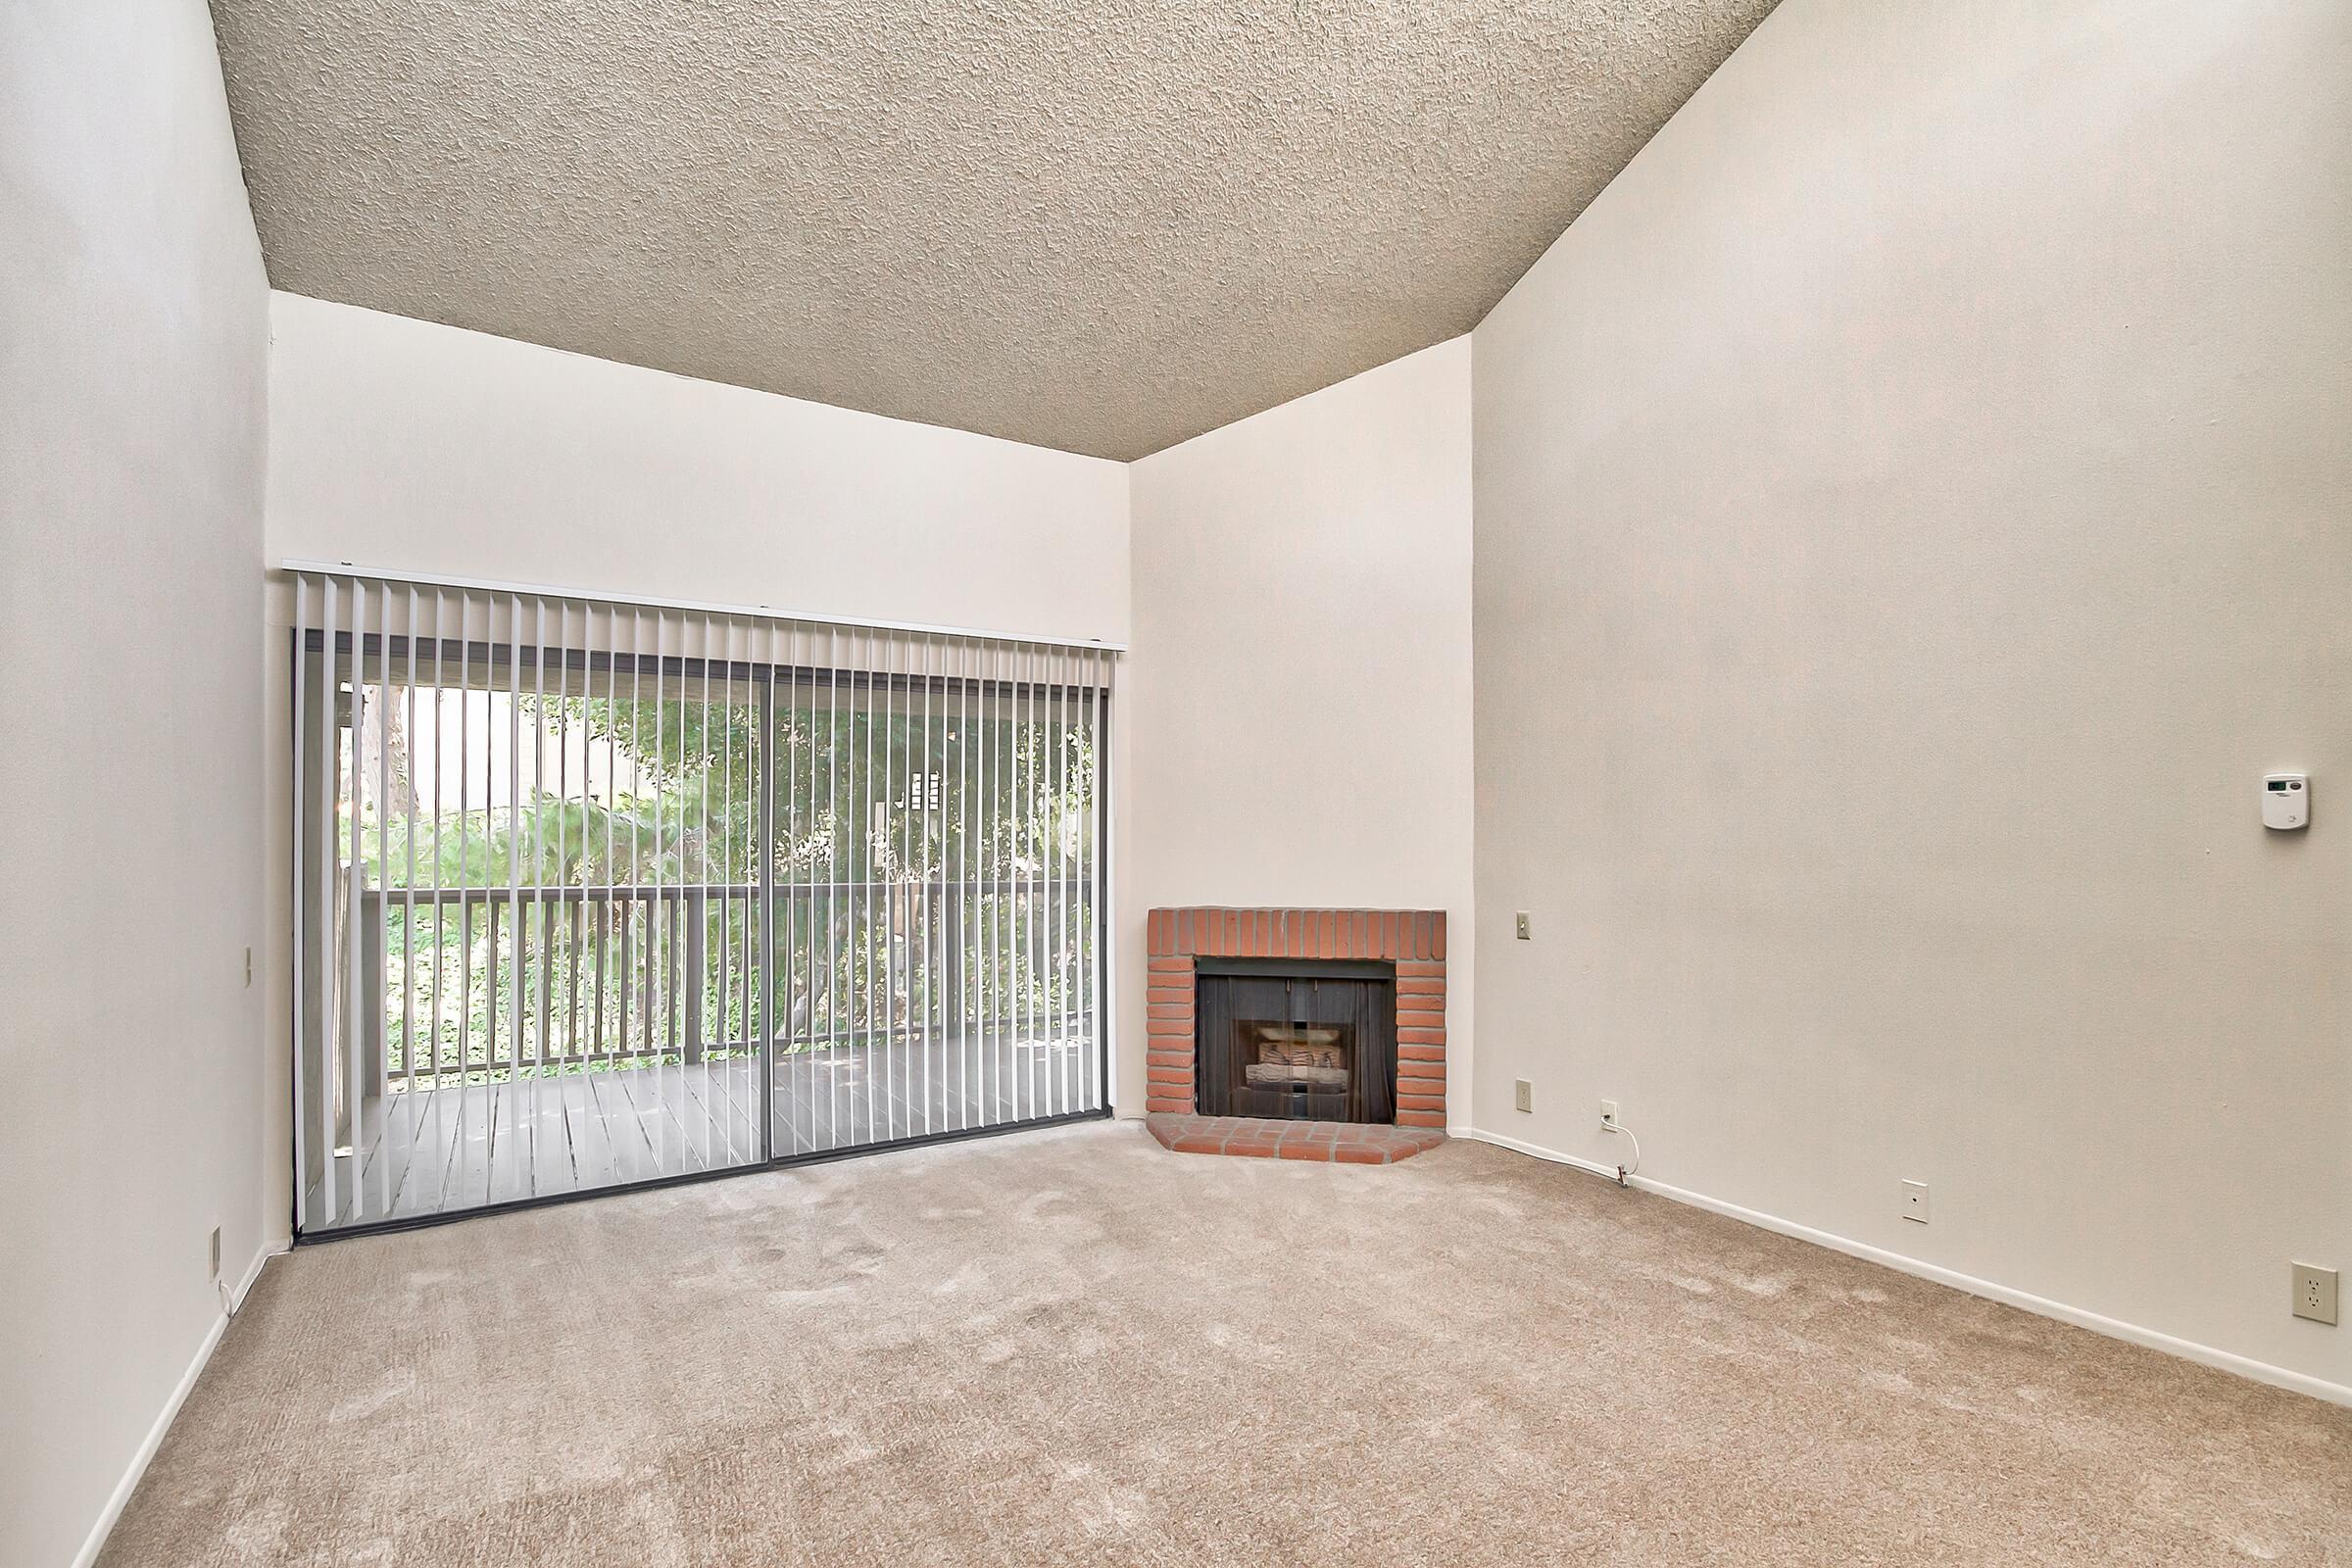 Living-Room_1207-21ST-AVE-NE-HICKORY-NC-28601-1872_HUNTINGTON-PARK-APTS_RPI_II-273044-39.jpg